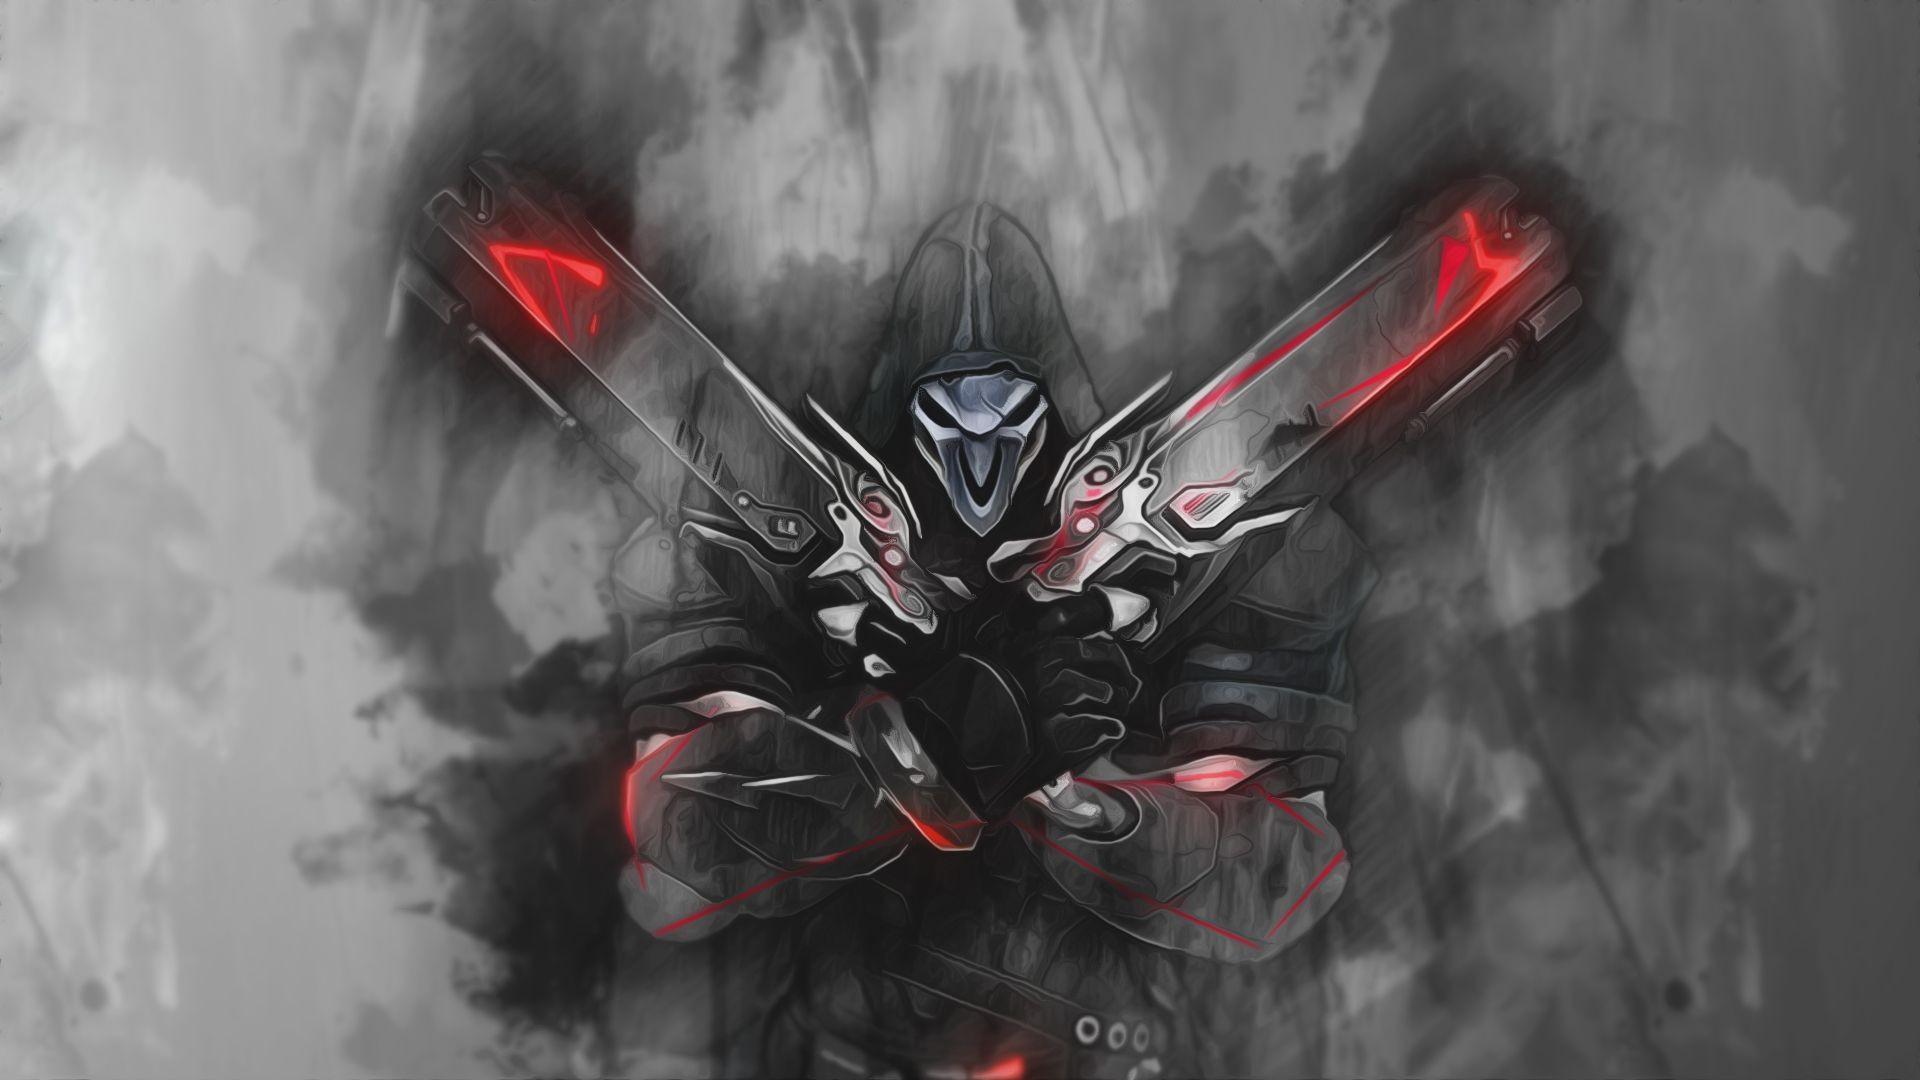 Reaper overwatch wallpaper download free amazing full - Reaper wallpaper ...